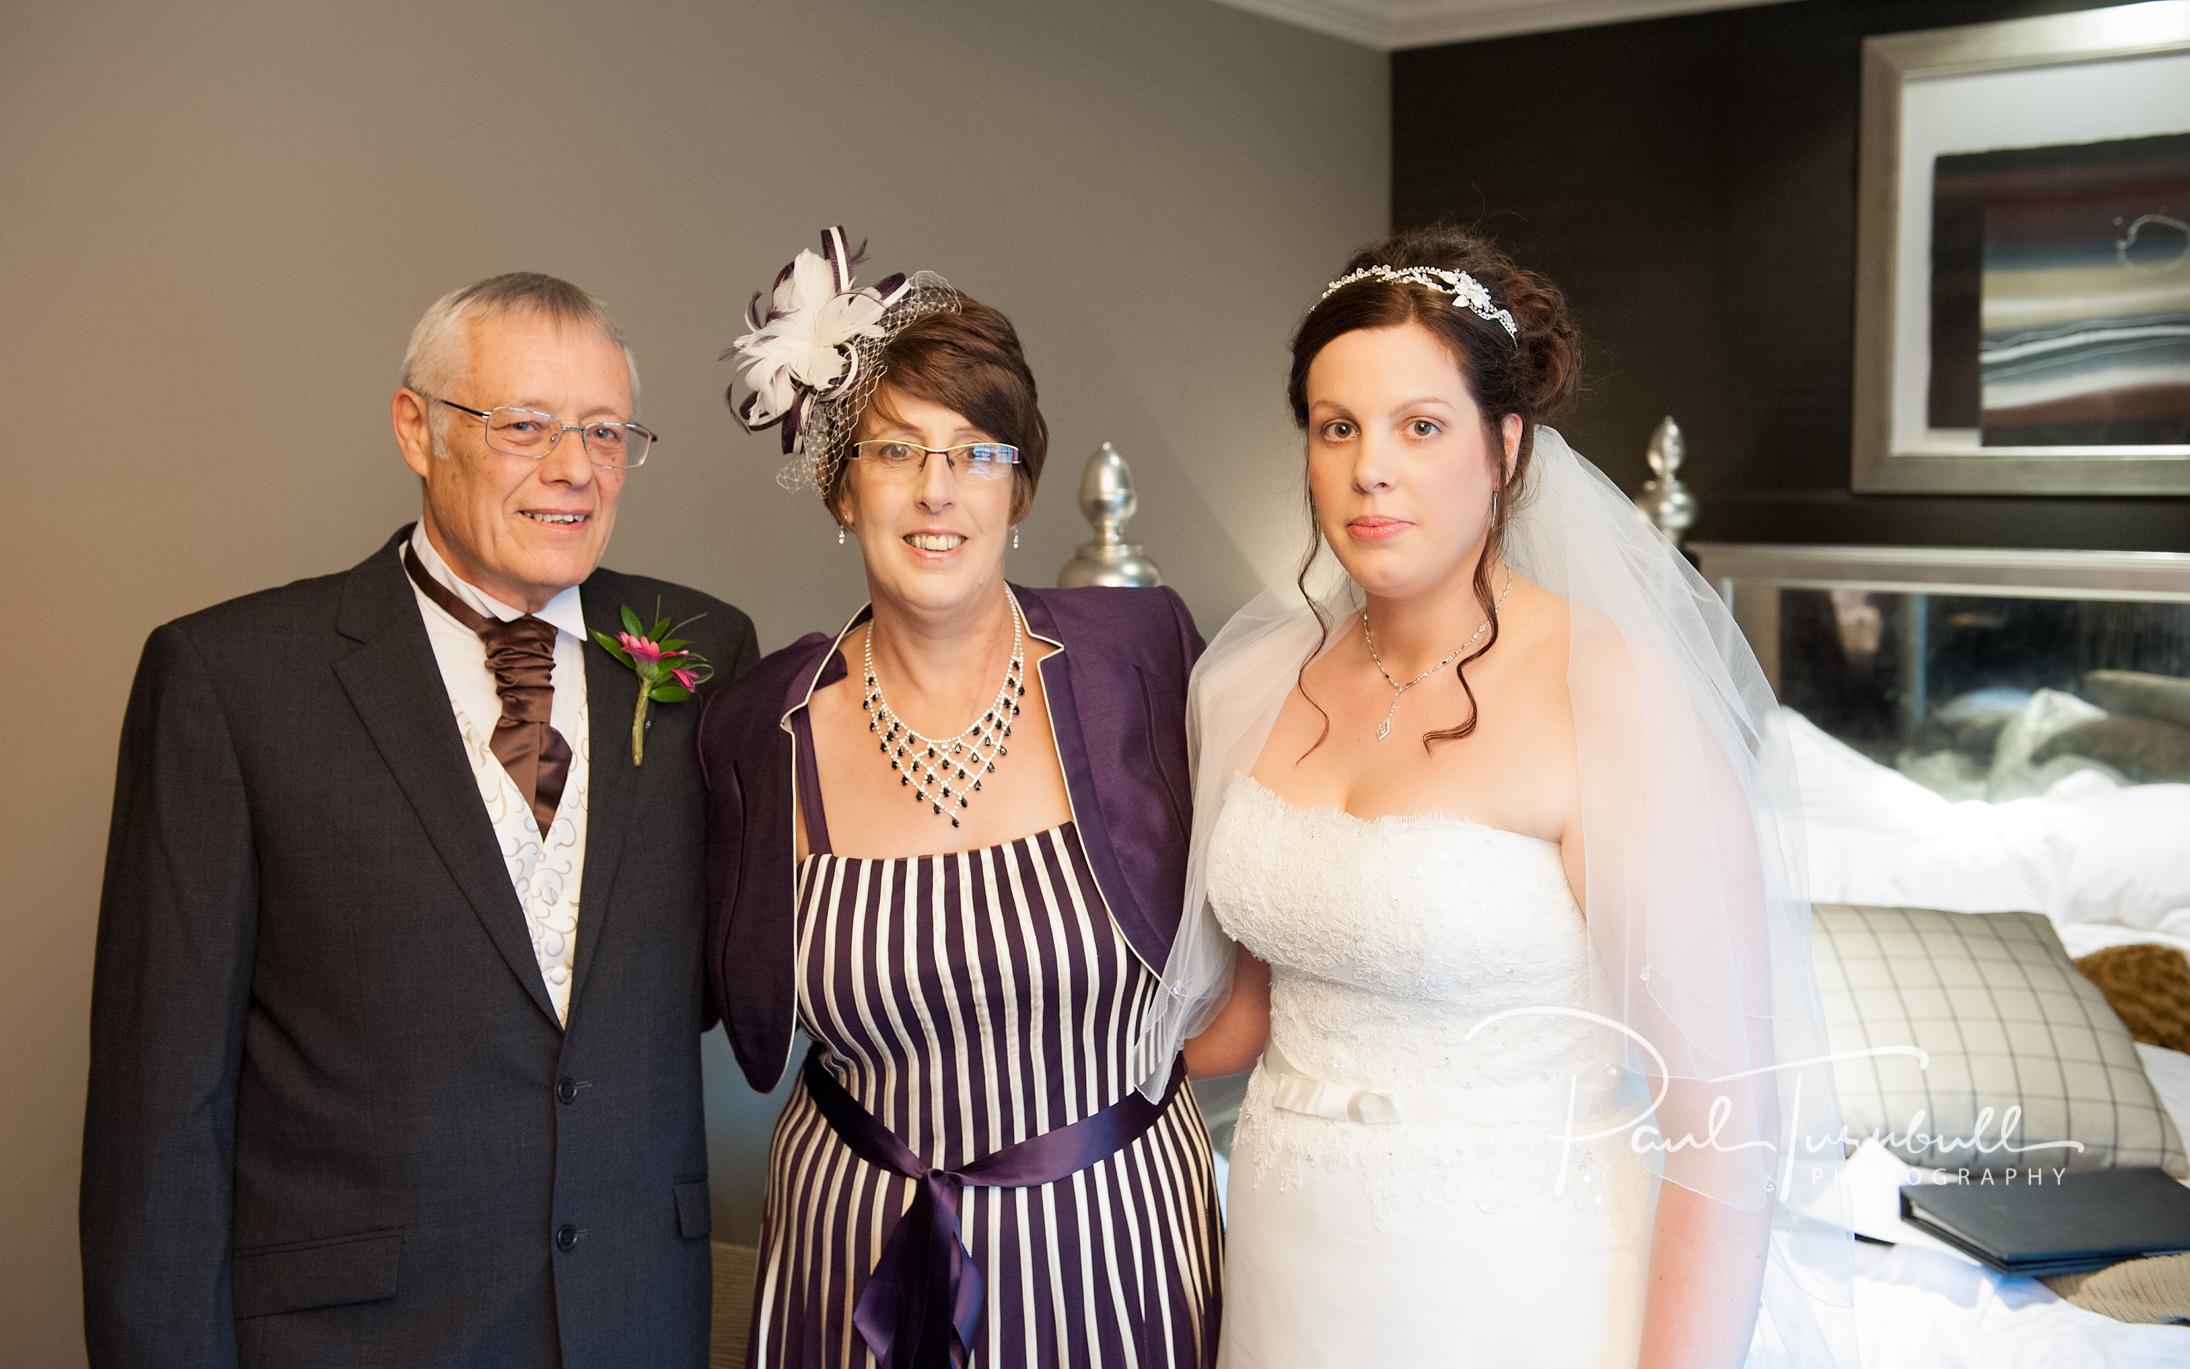 wedding-photography-wood-hall-wetherby-yorkshire-021.jpg